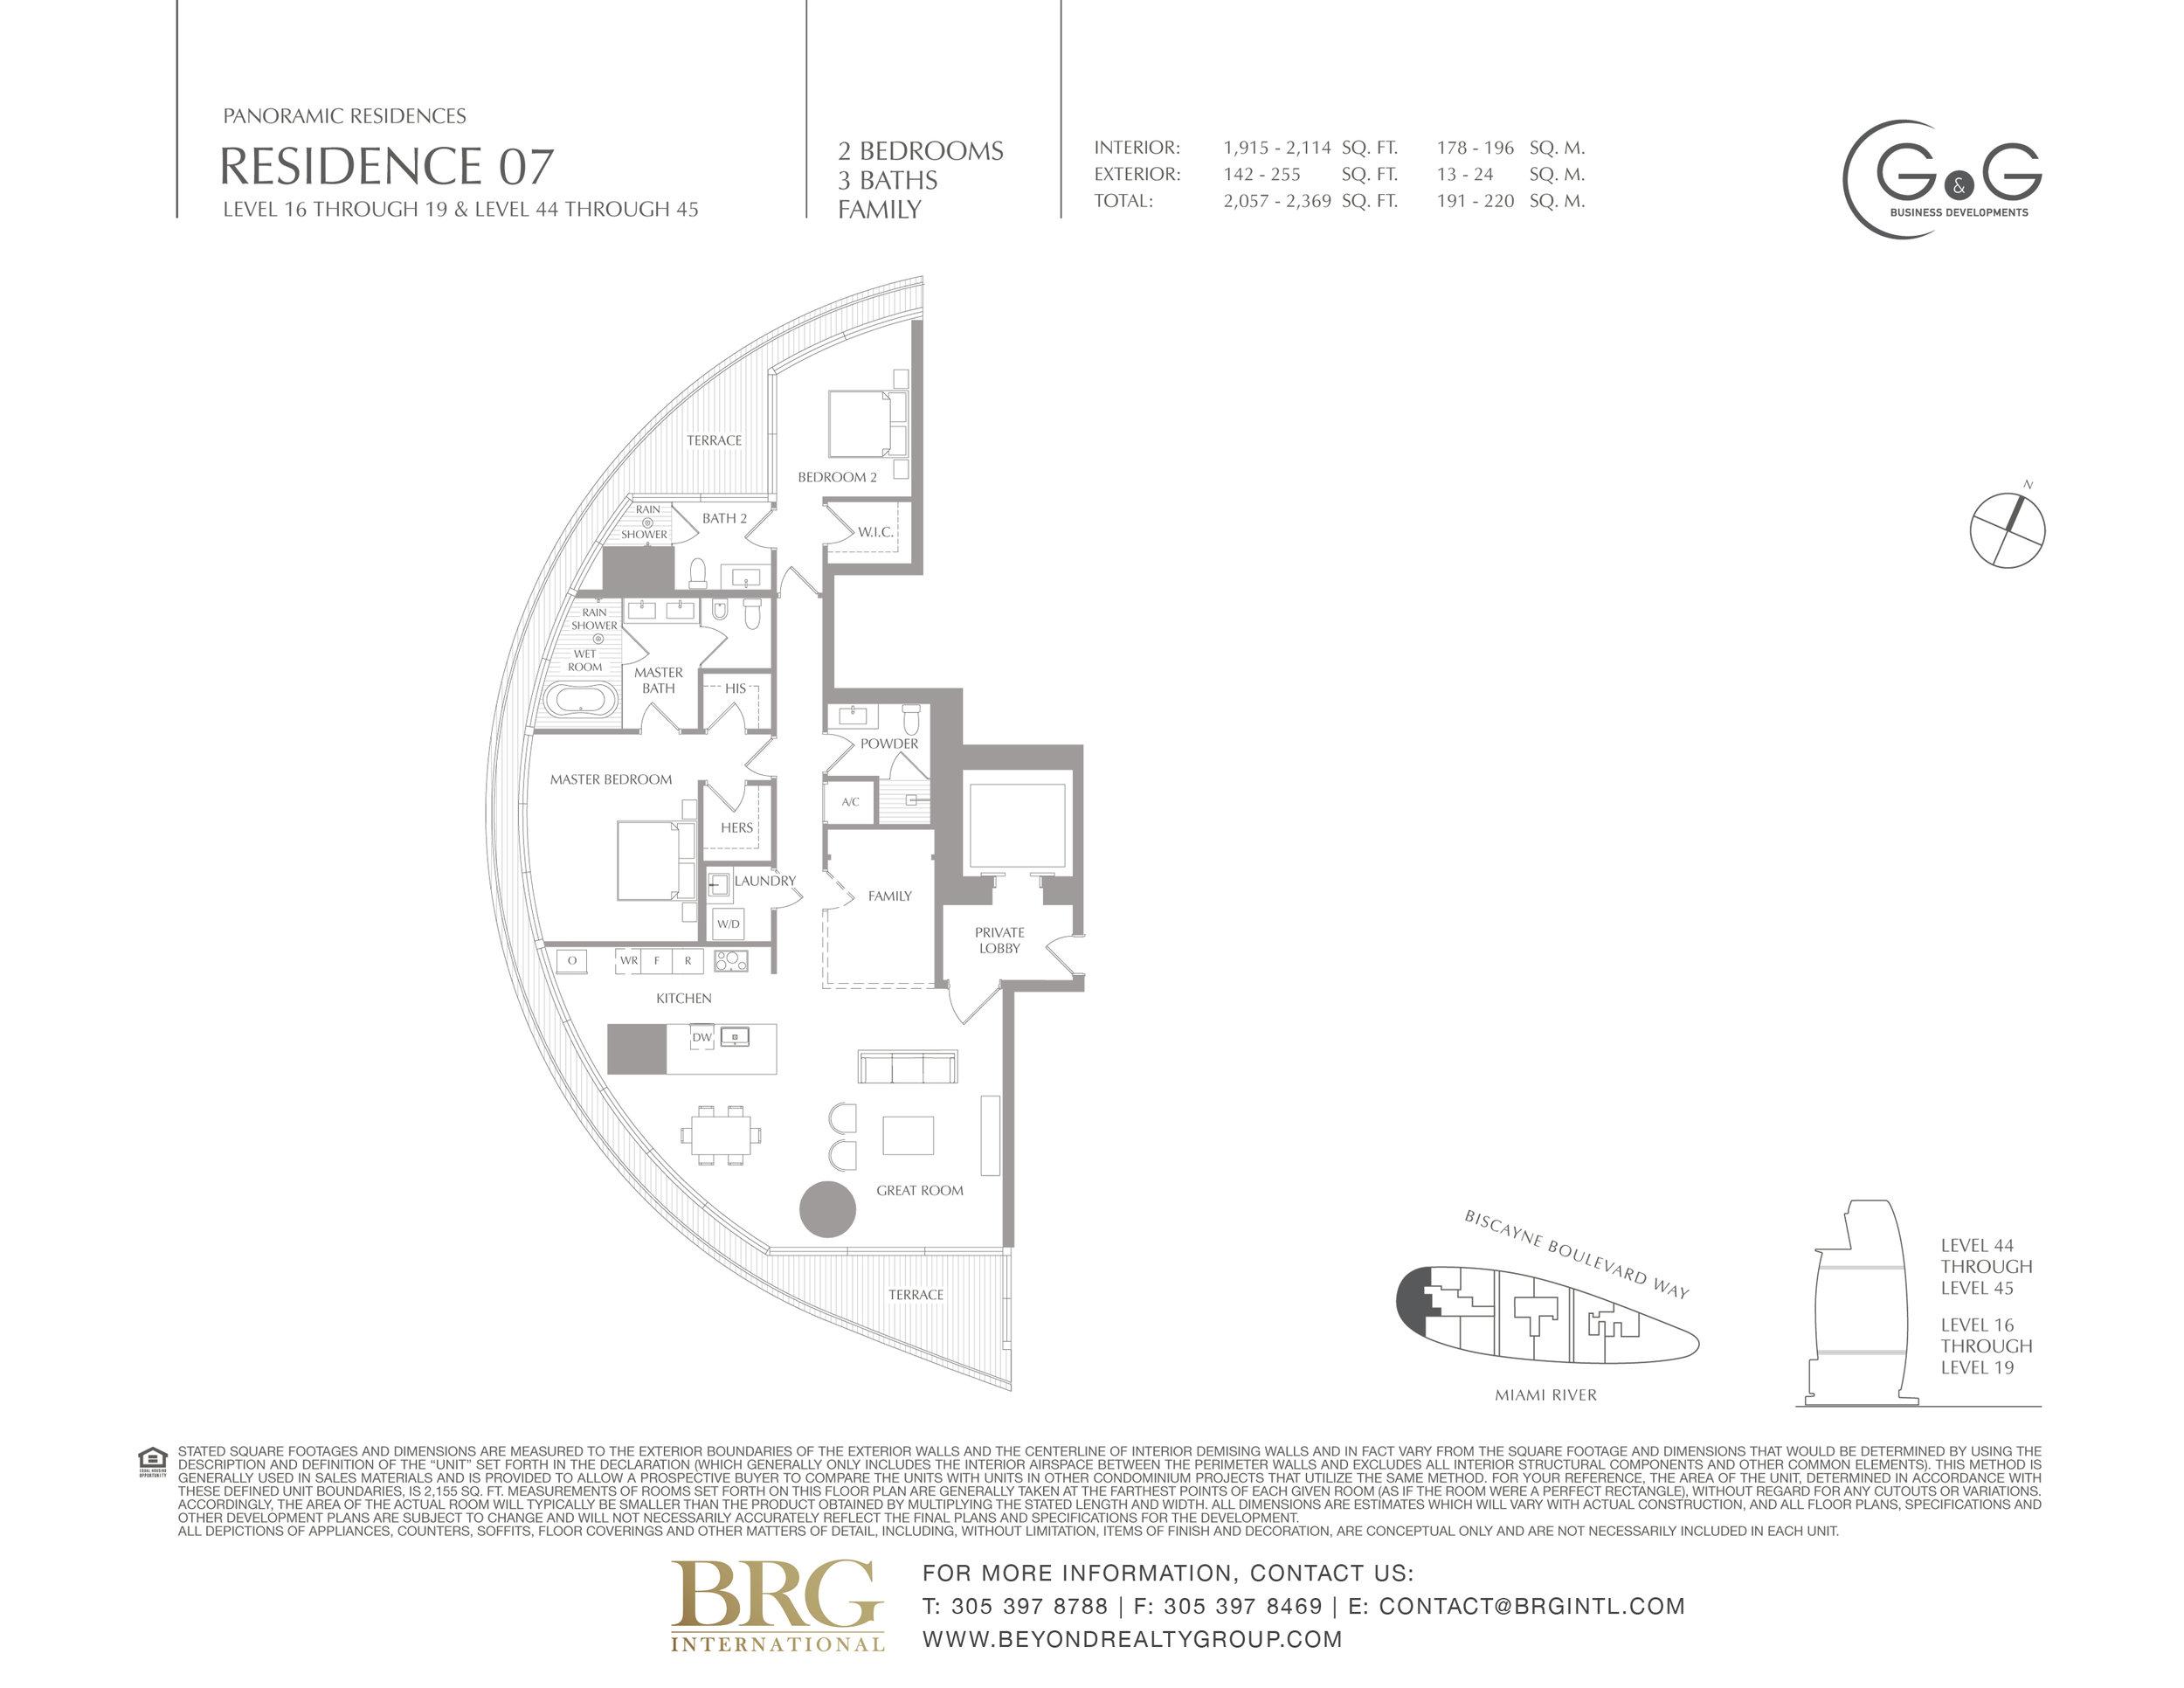 Aston-Martin-Residences-Brochure-19.jpg